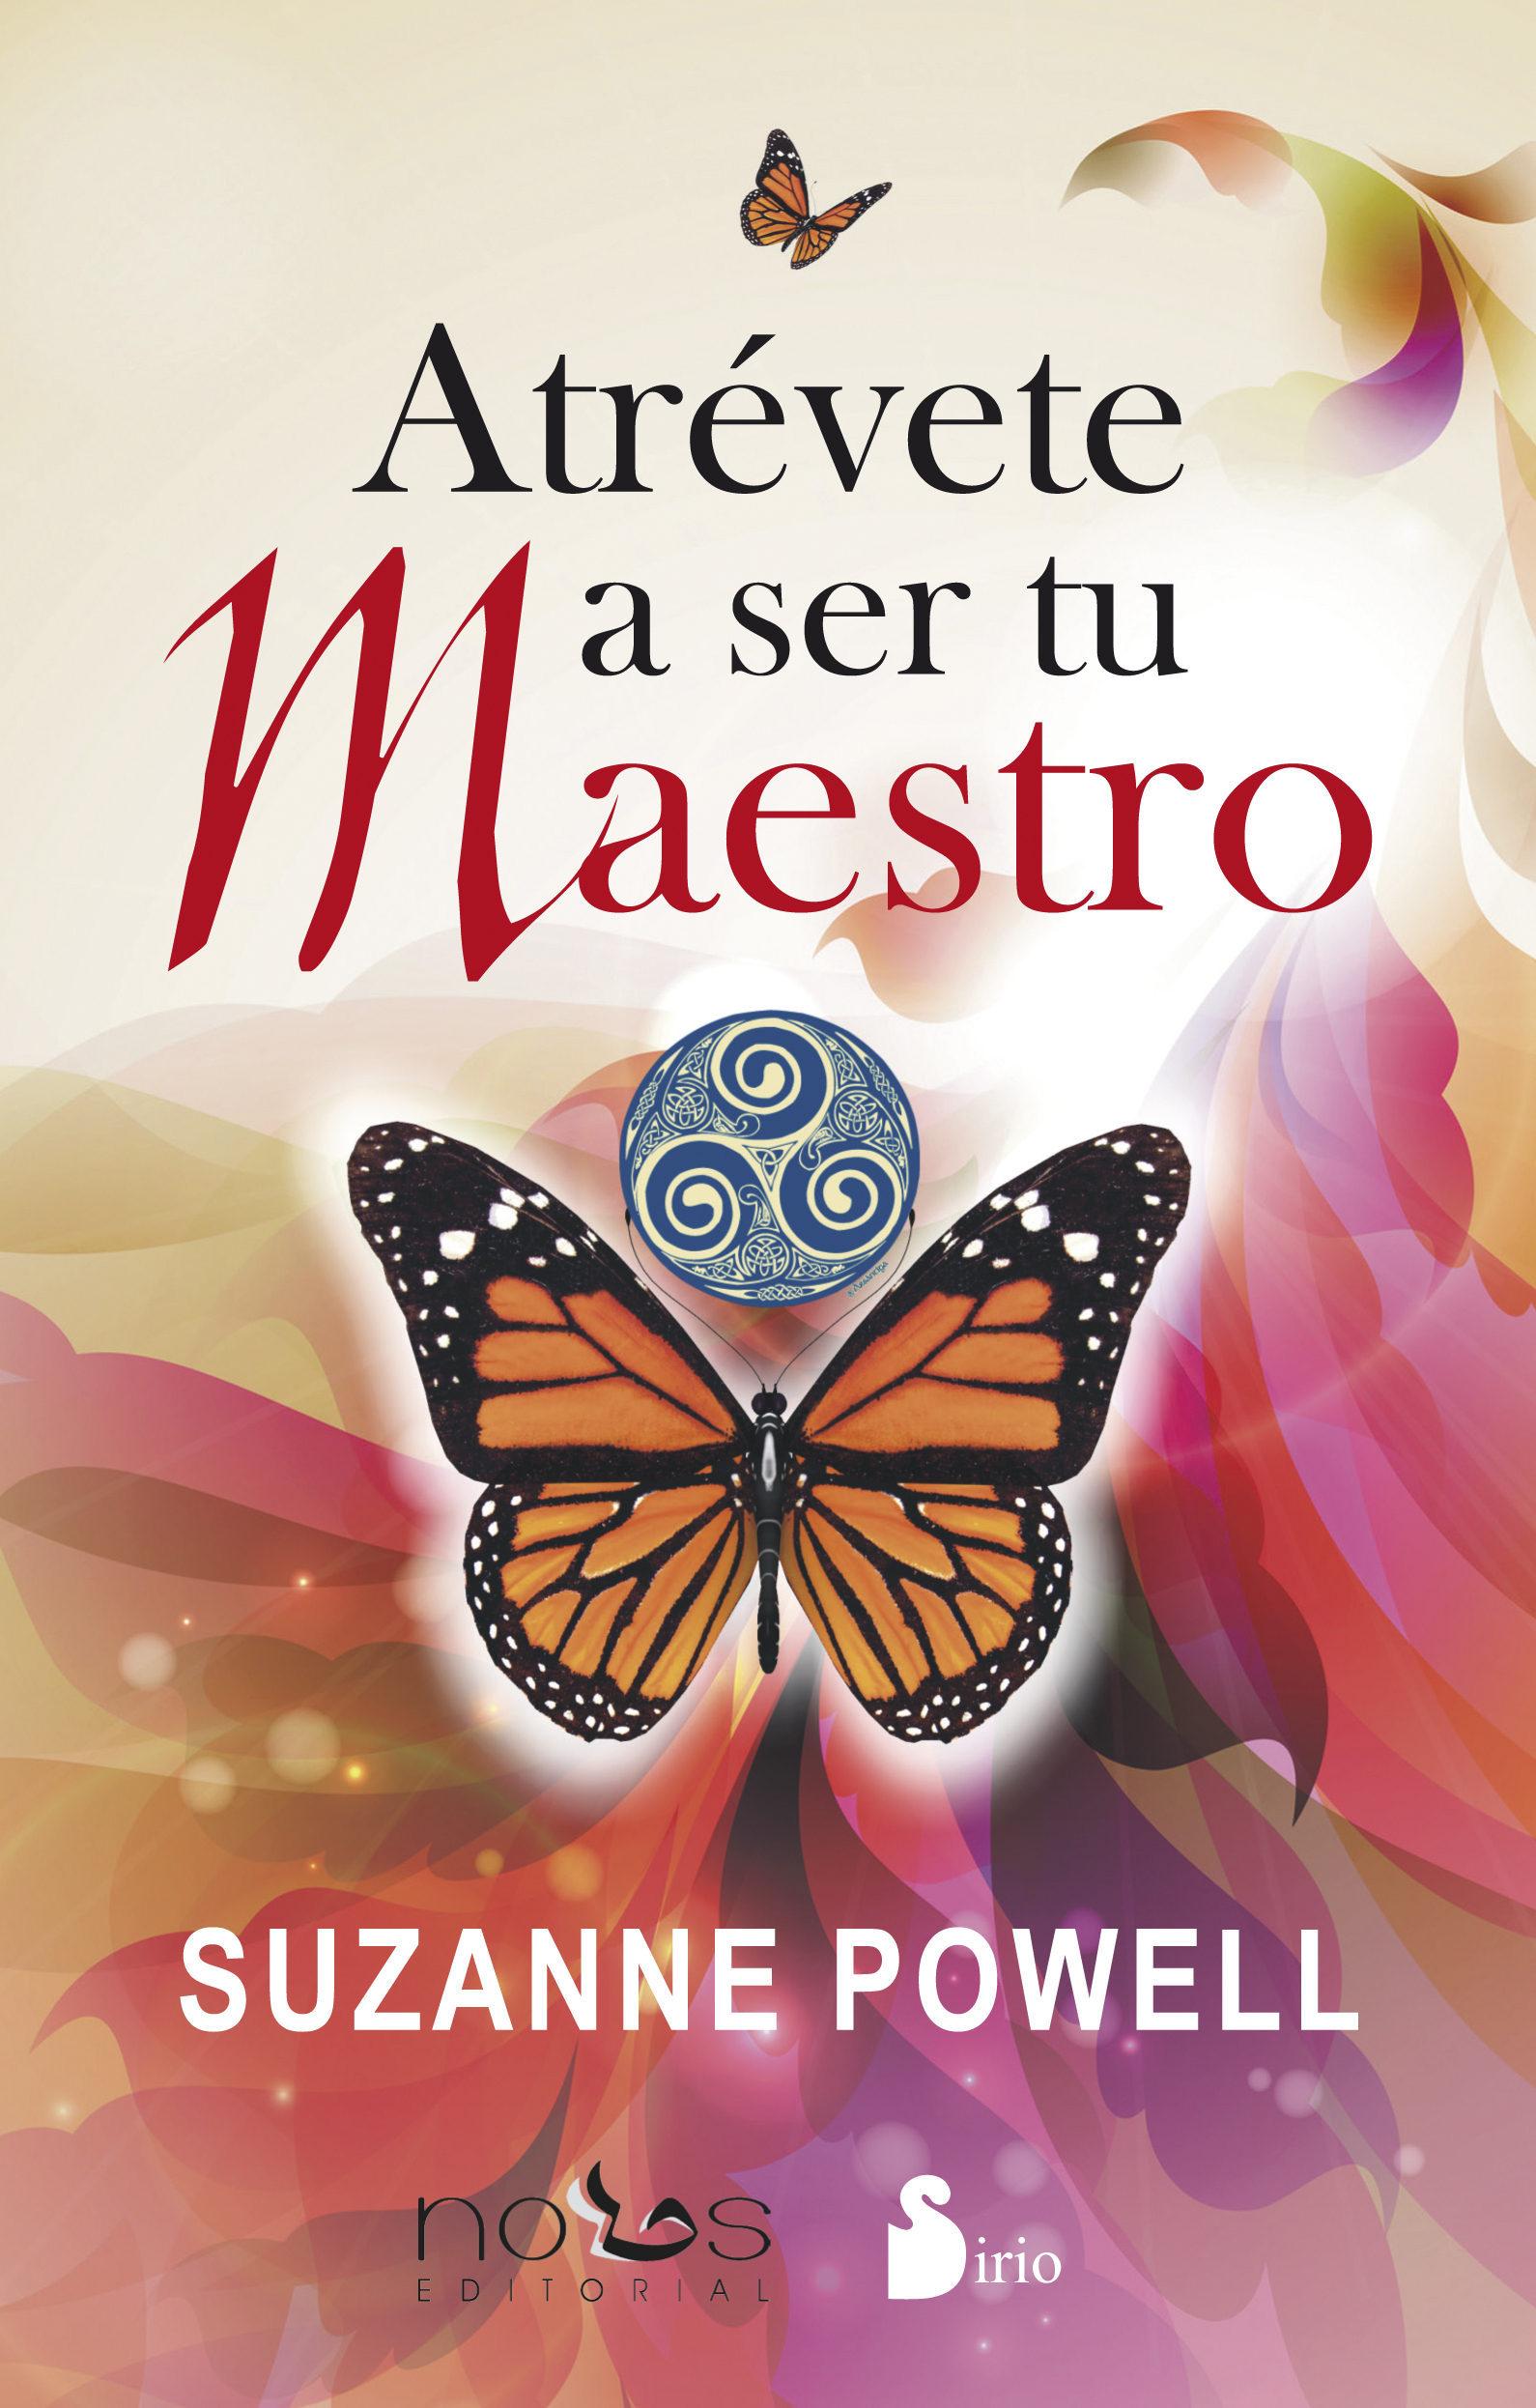 Atrevete a ser tu maestro - Suzanne Powell - Sirio